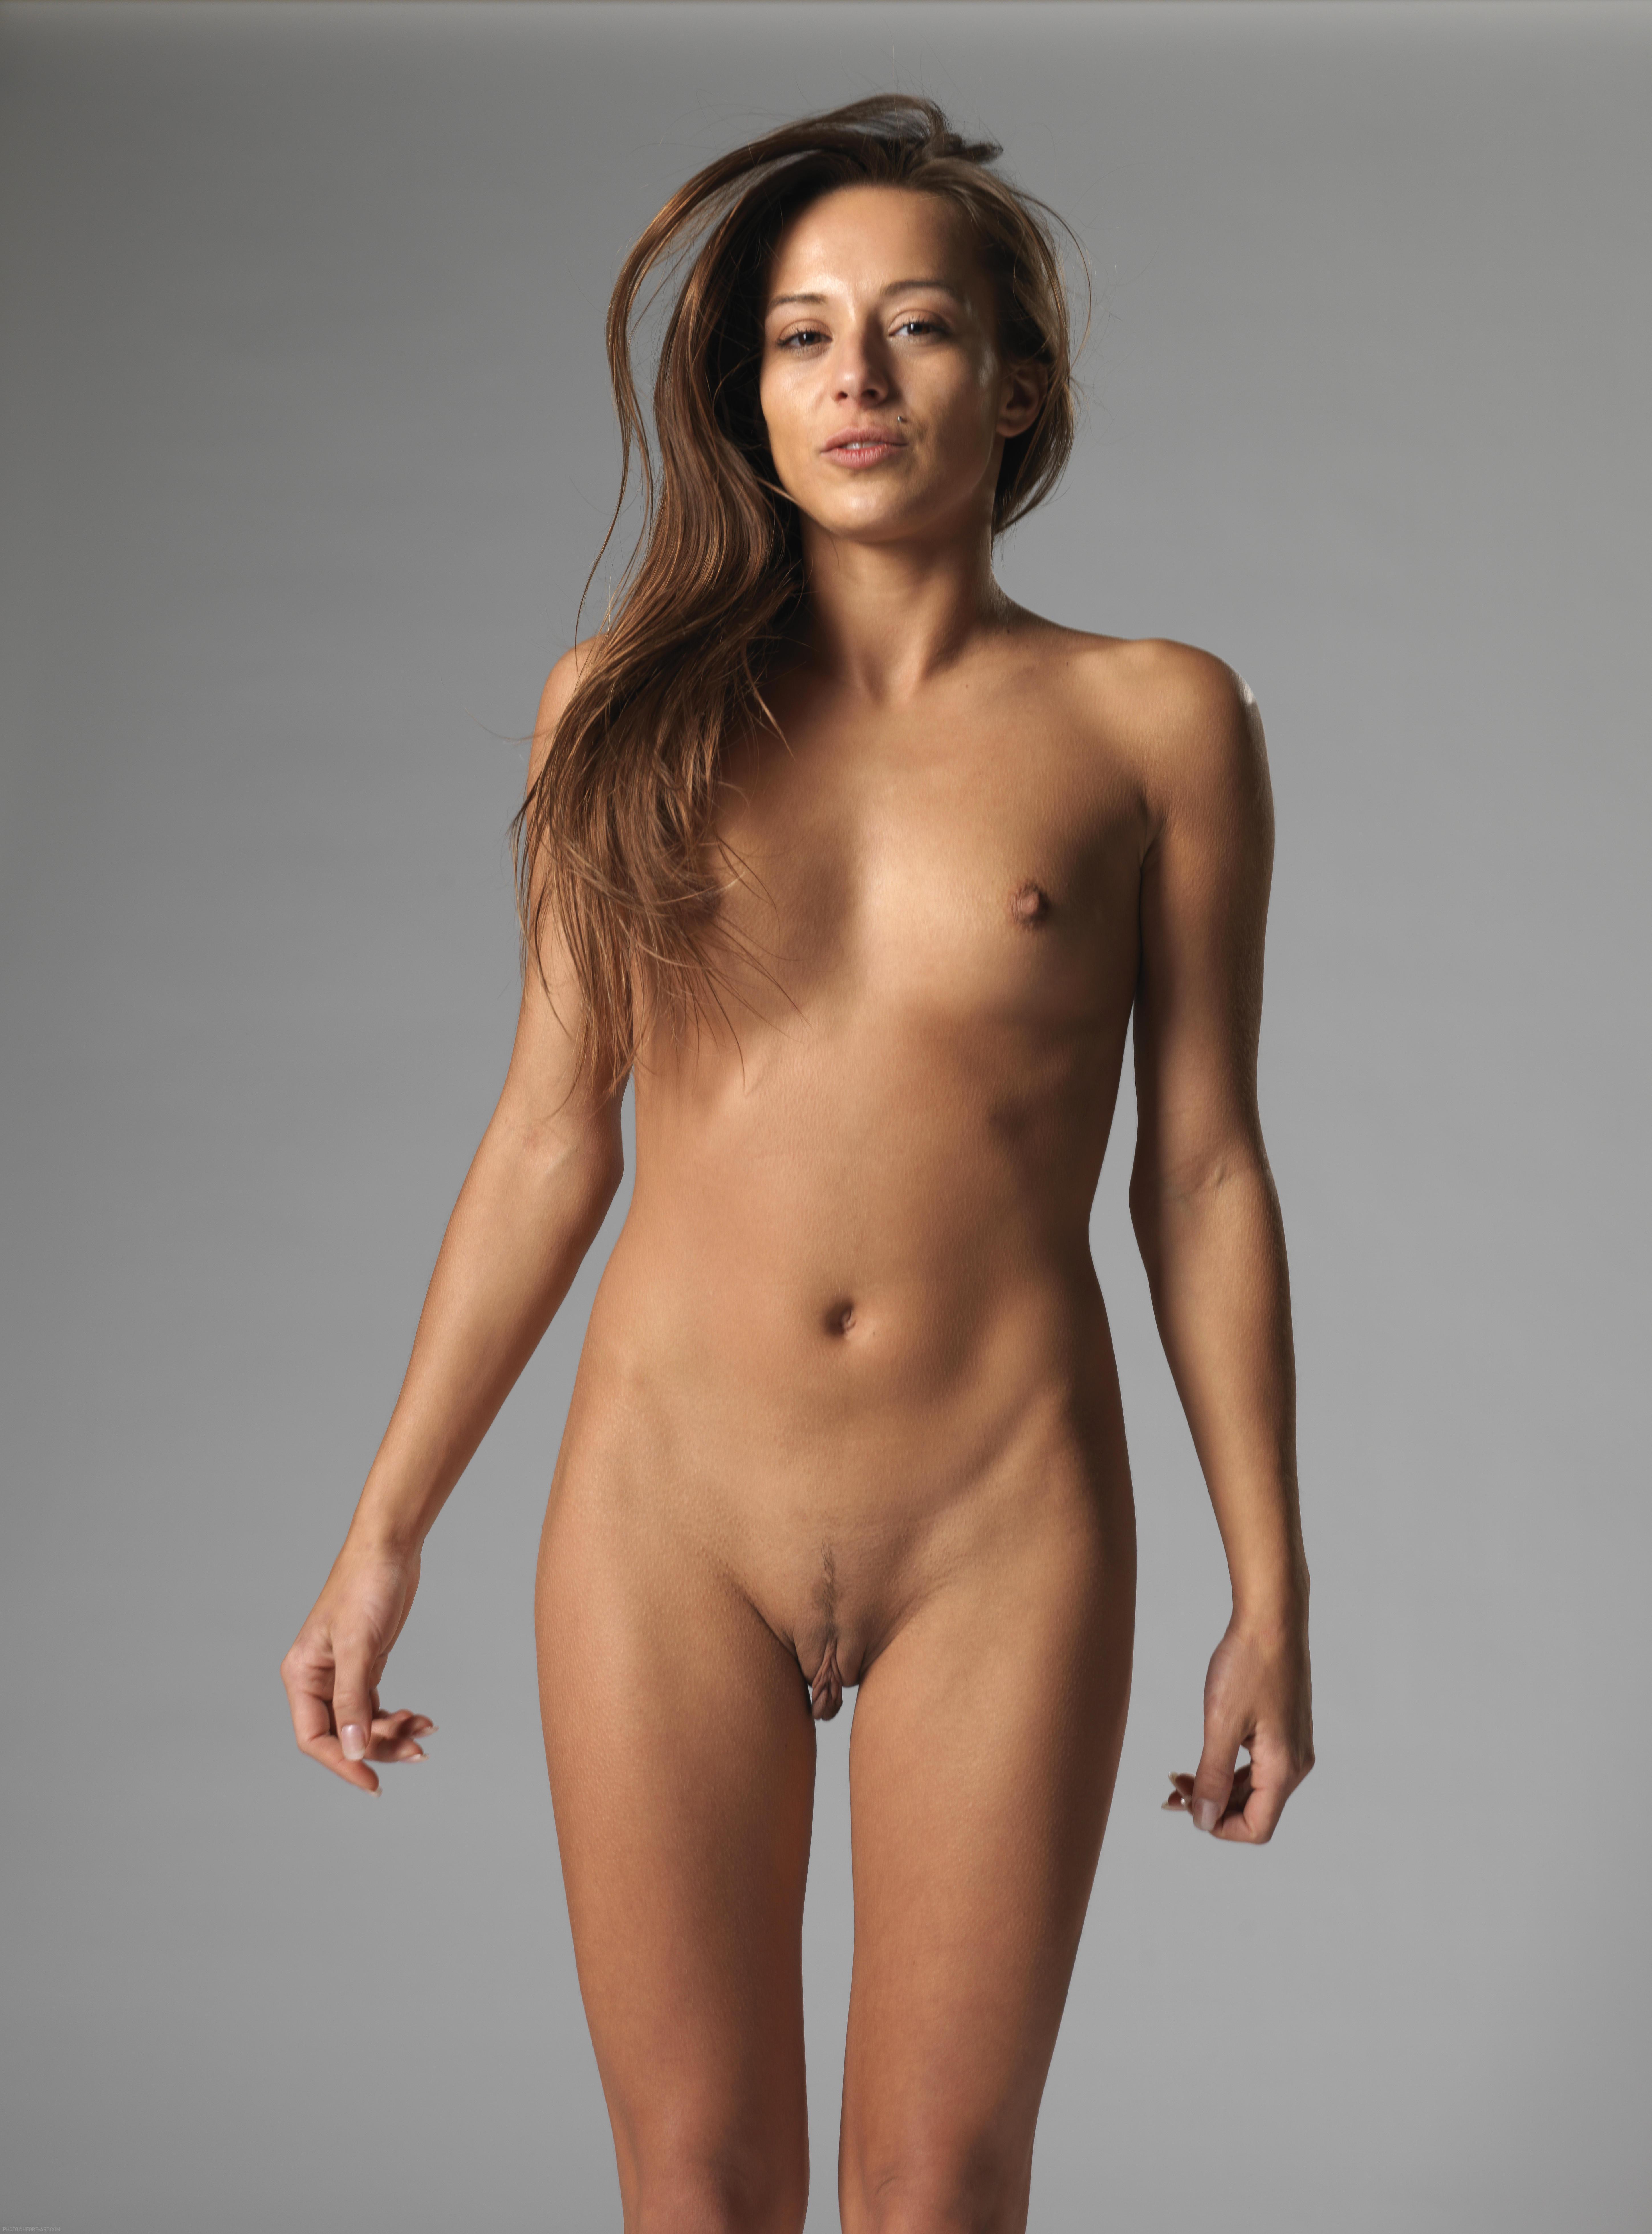 cibulkova naked